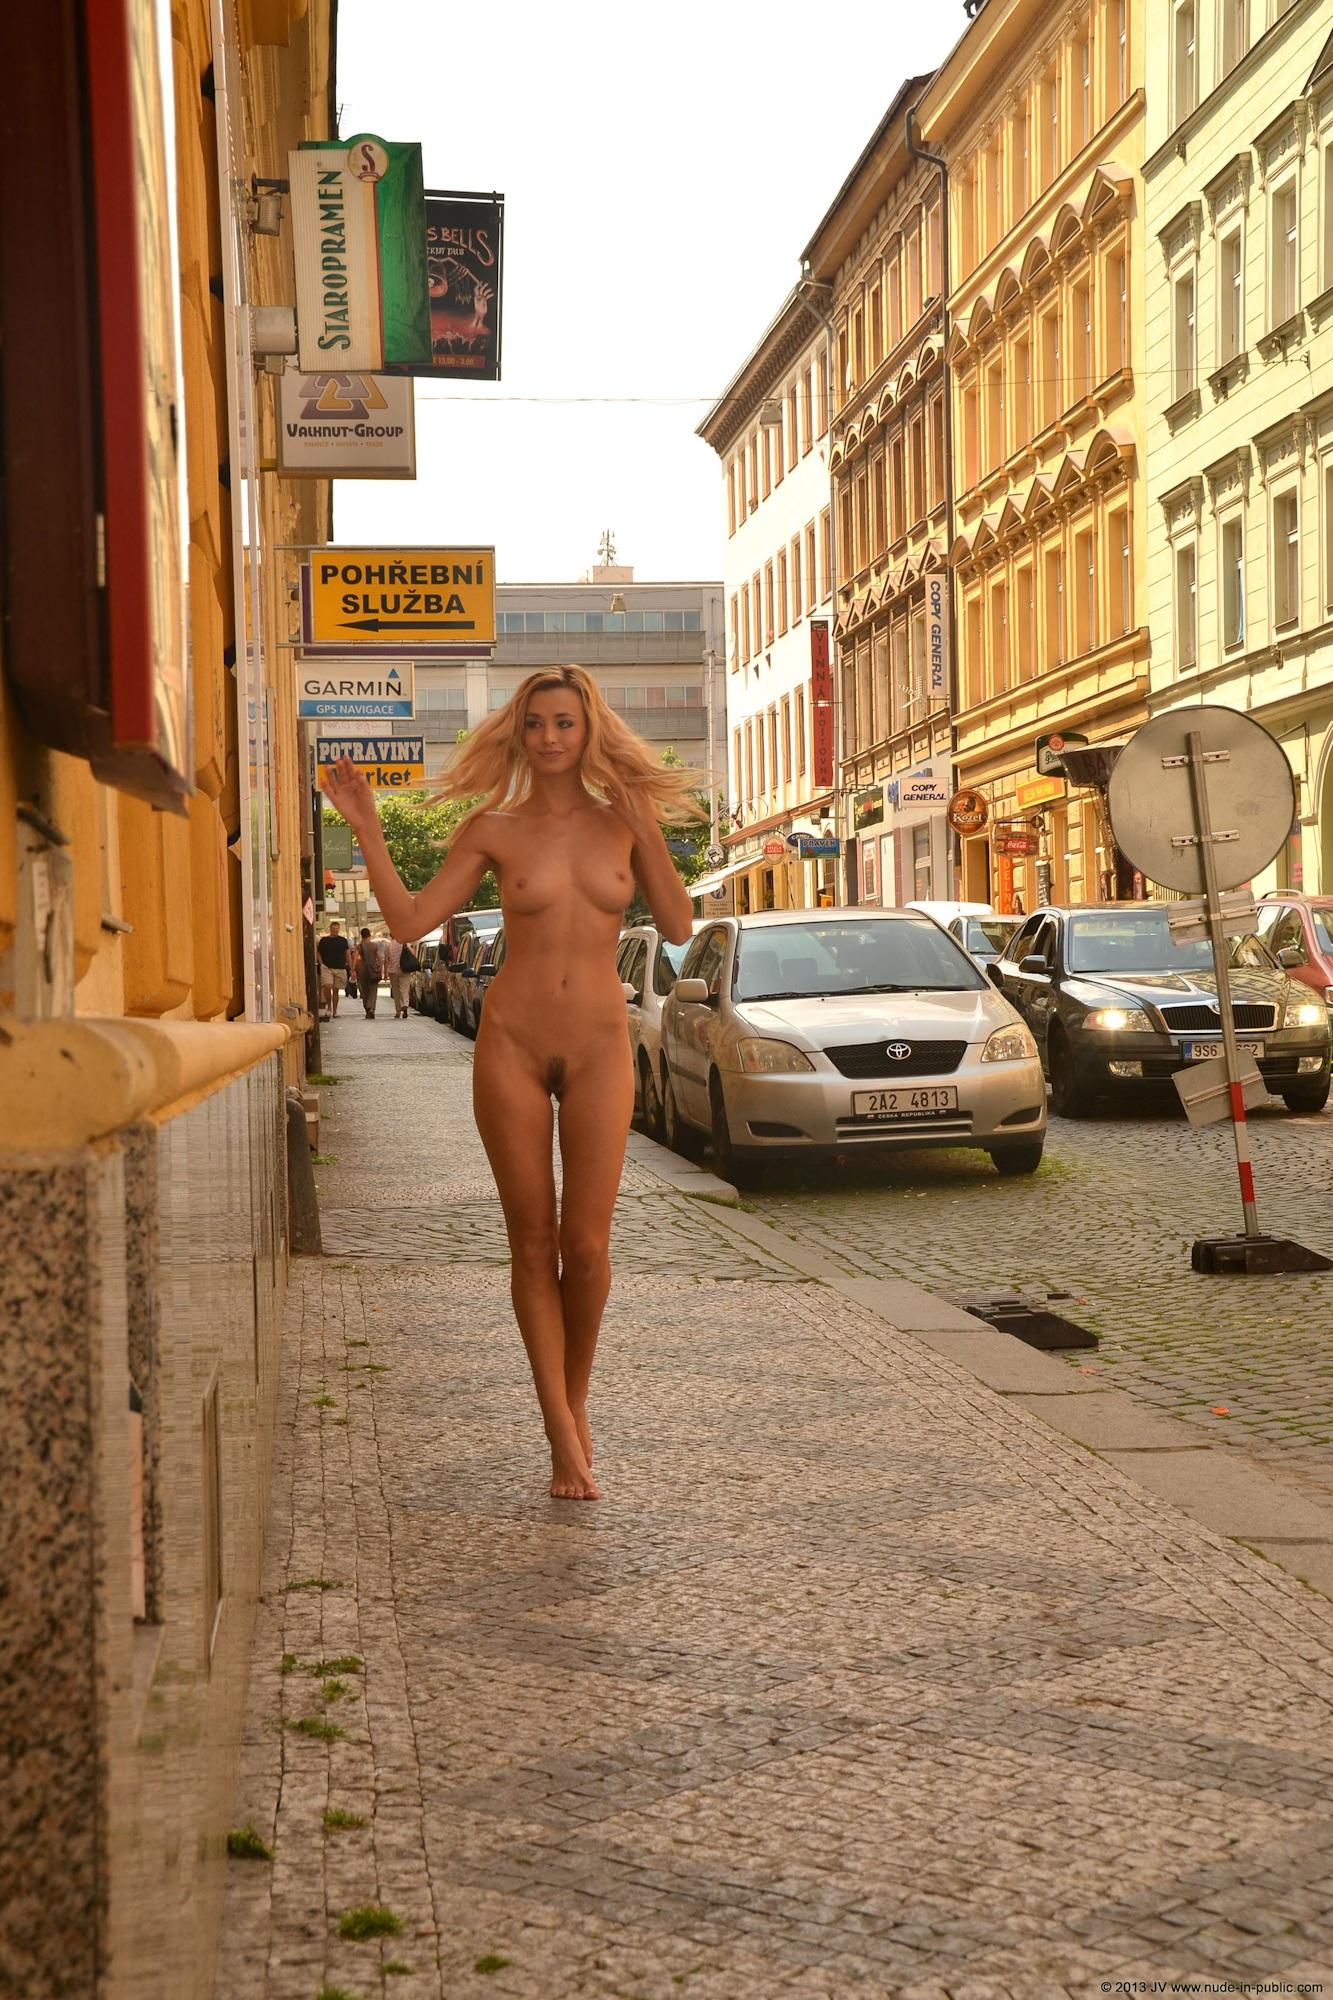 dominika-j-nude-in-public